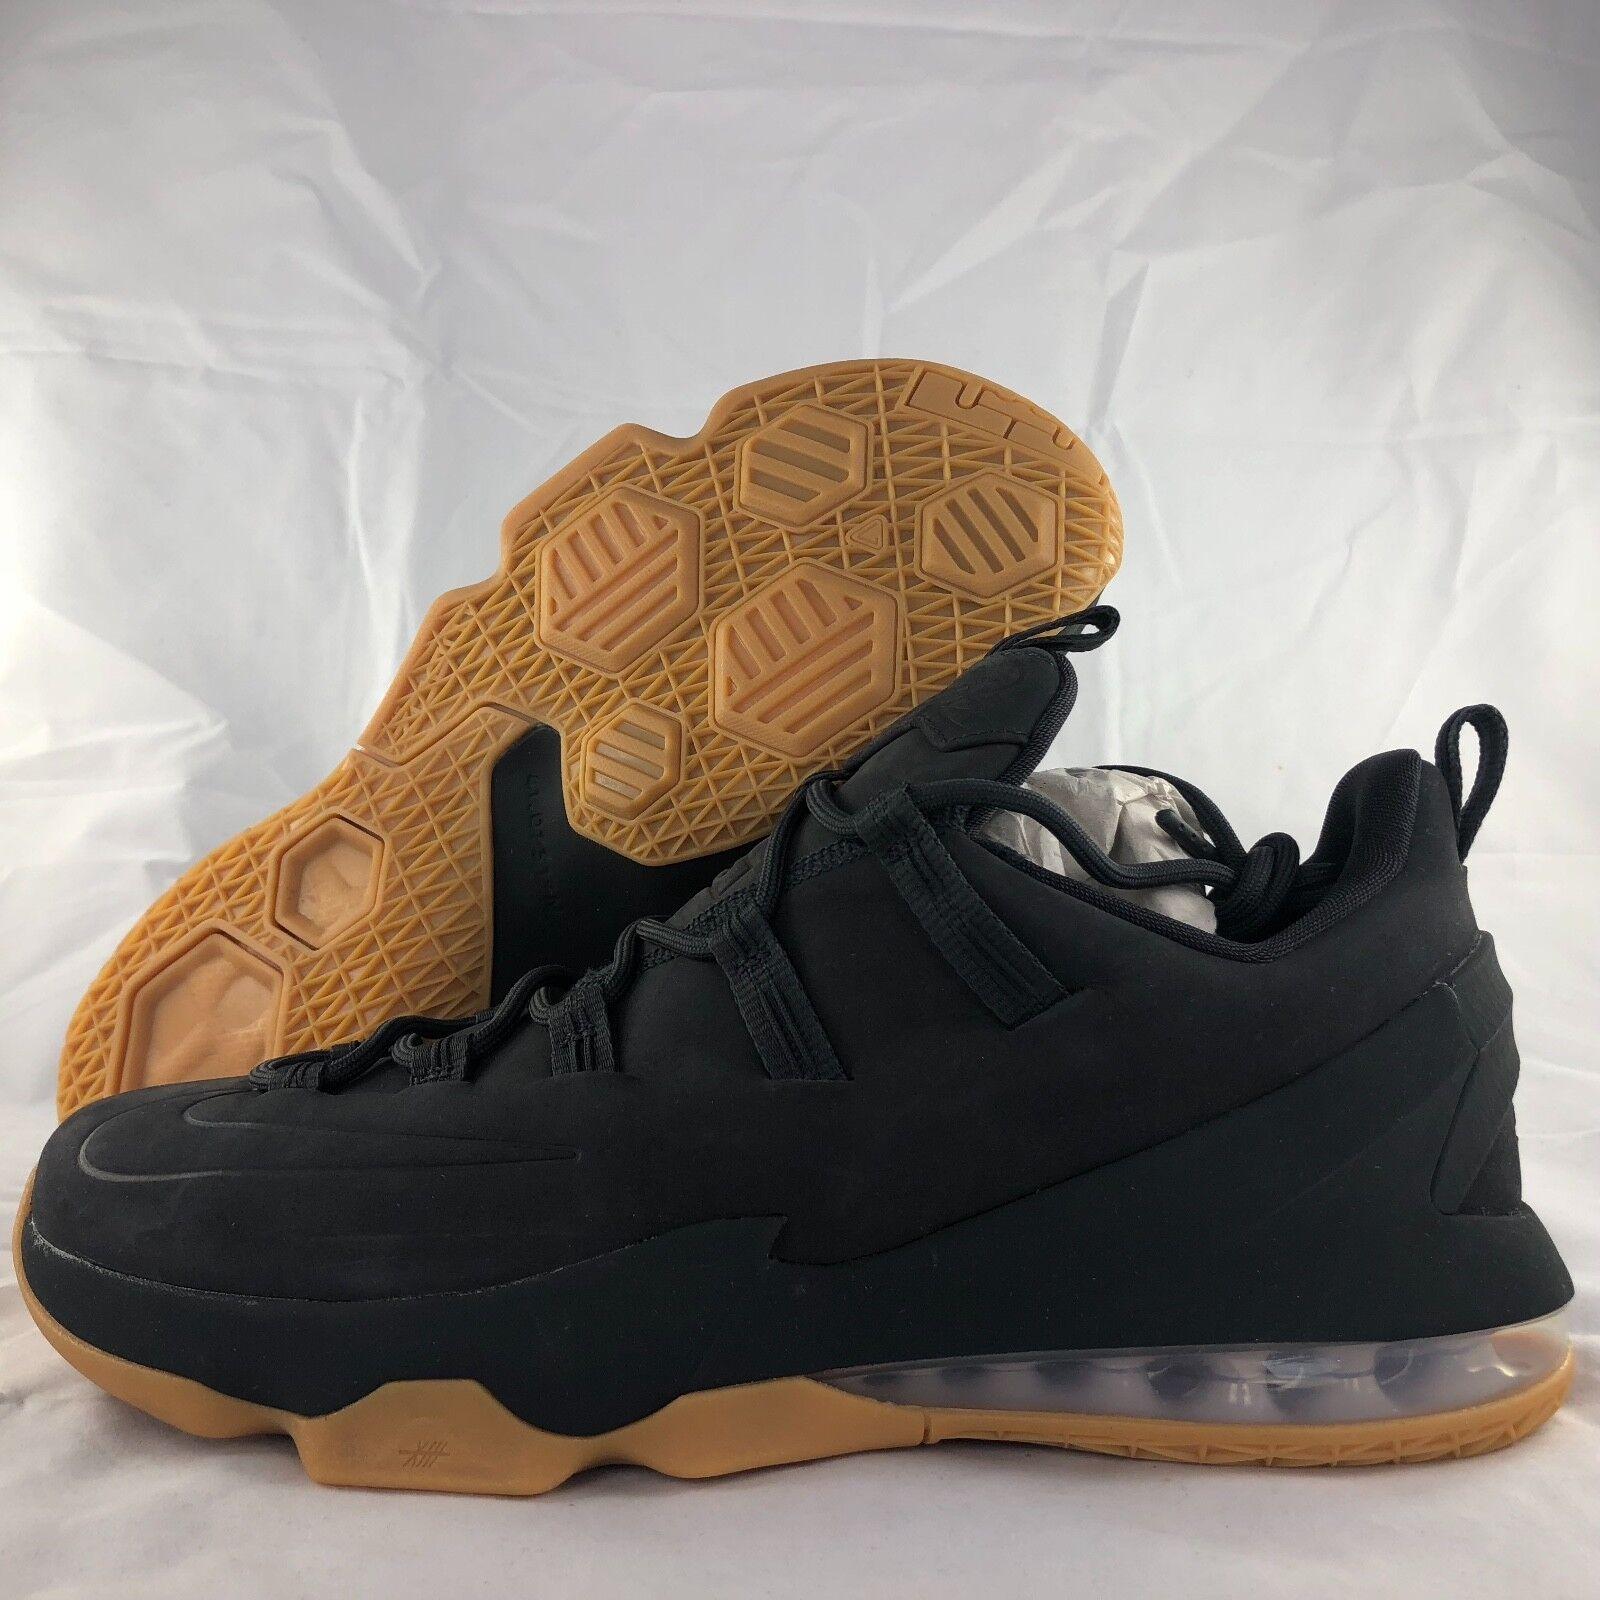 Nike Lebron XIII 13 Low PRM Anthracite Dark Grey Suede Gum AH8289-001 Men's 8-13